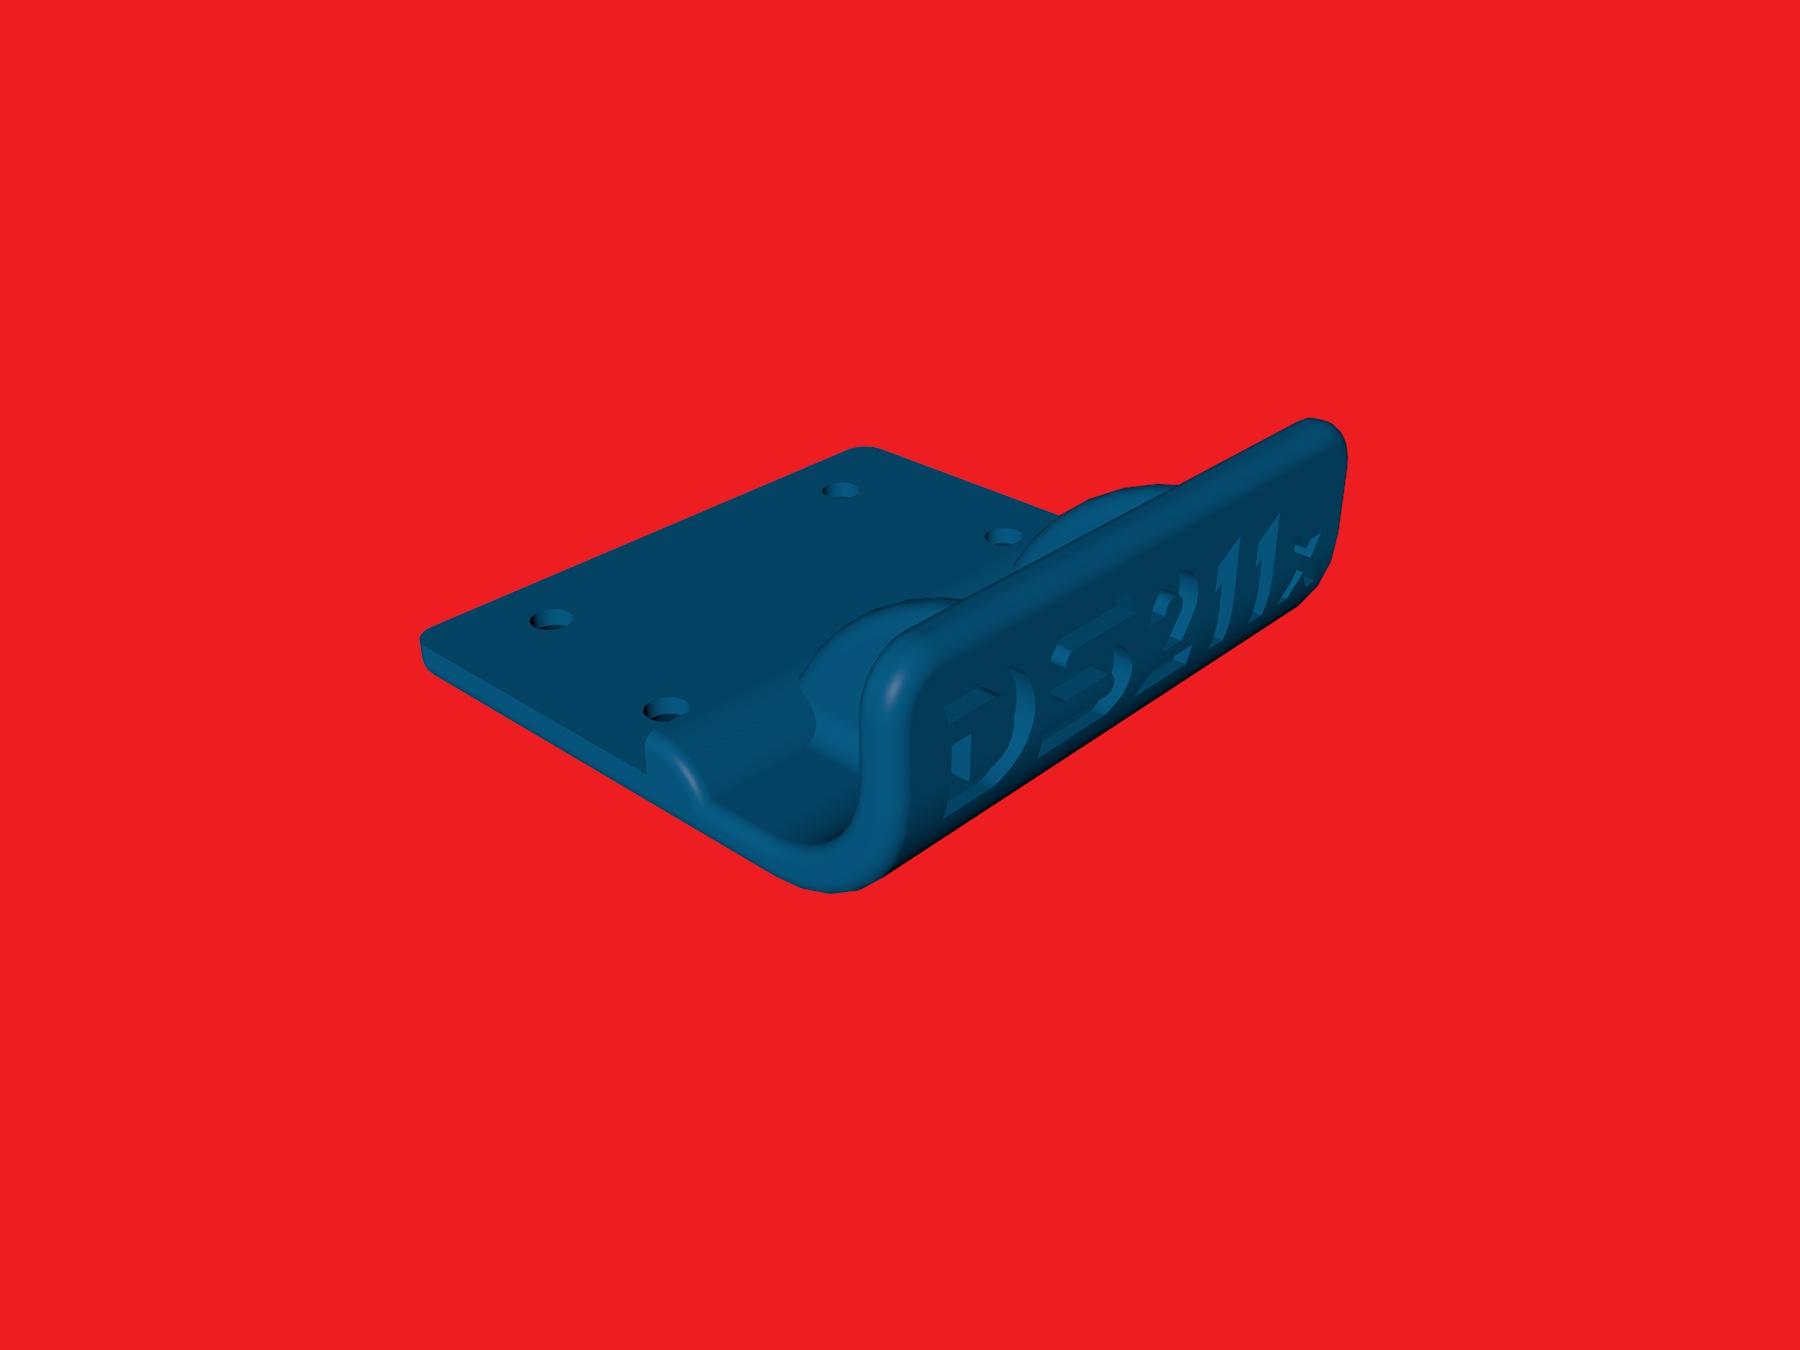 tamiya wrenchdog dyna storm dyna blaster conversion kickup front bumper db211x ds211x